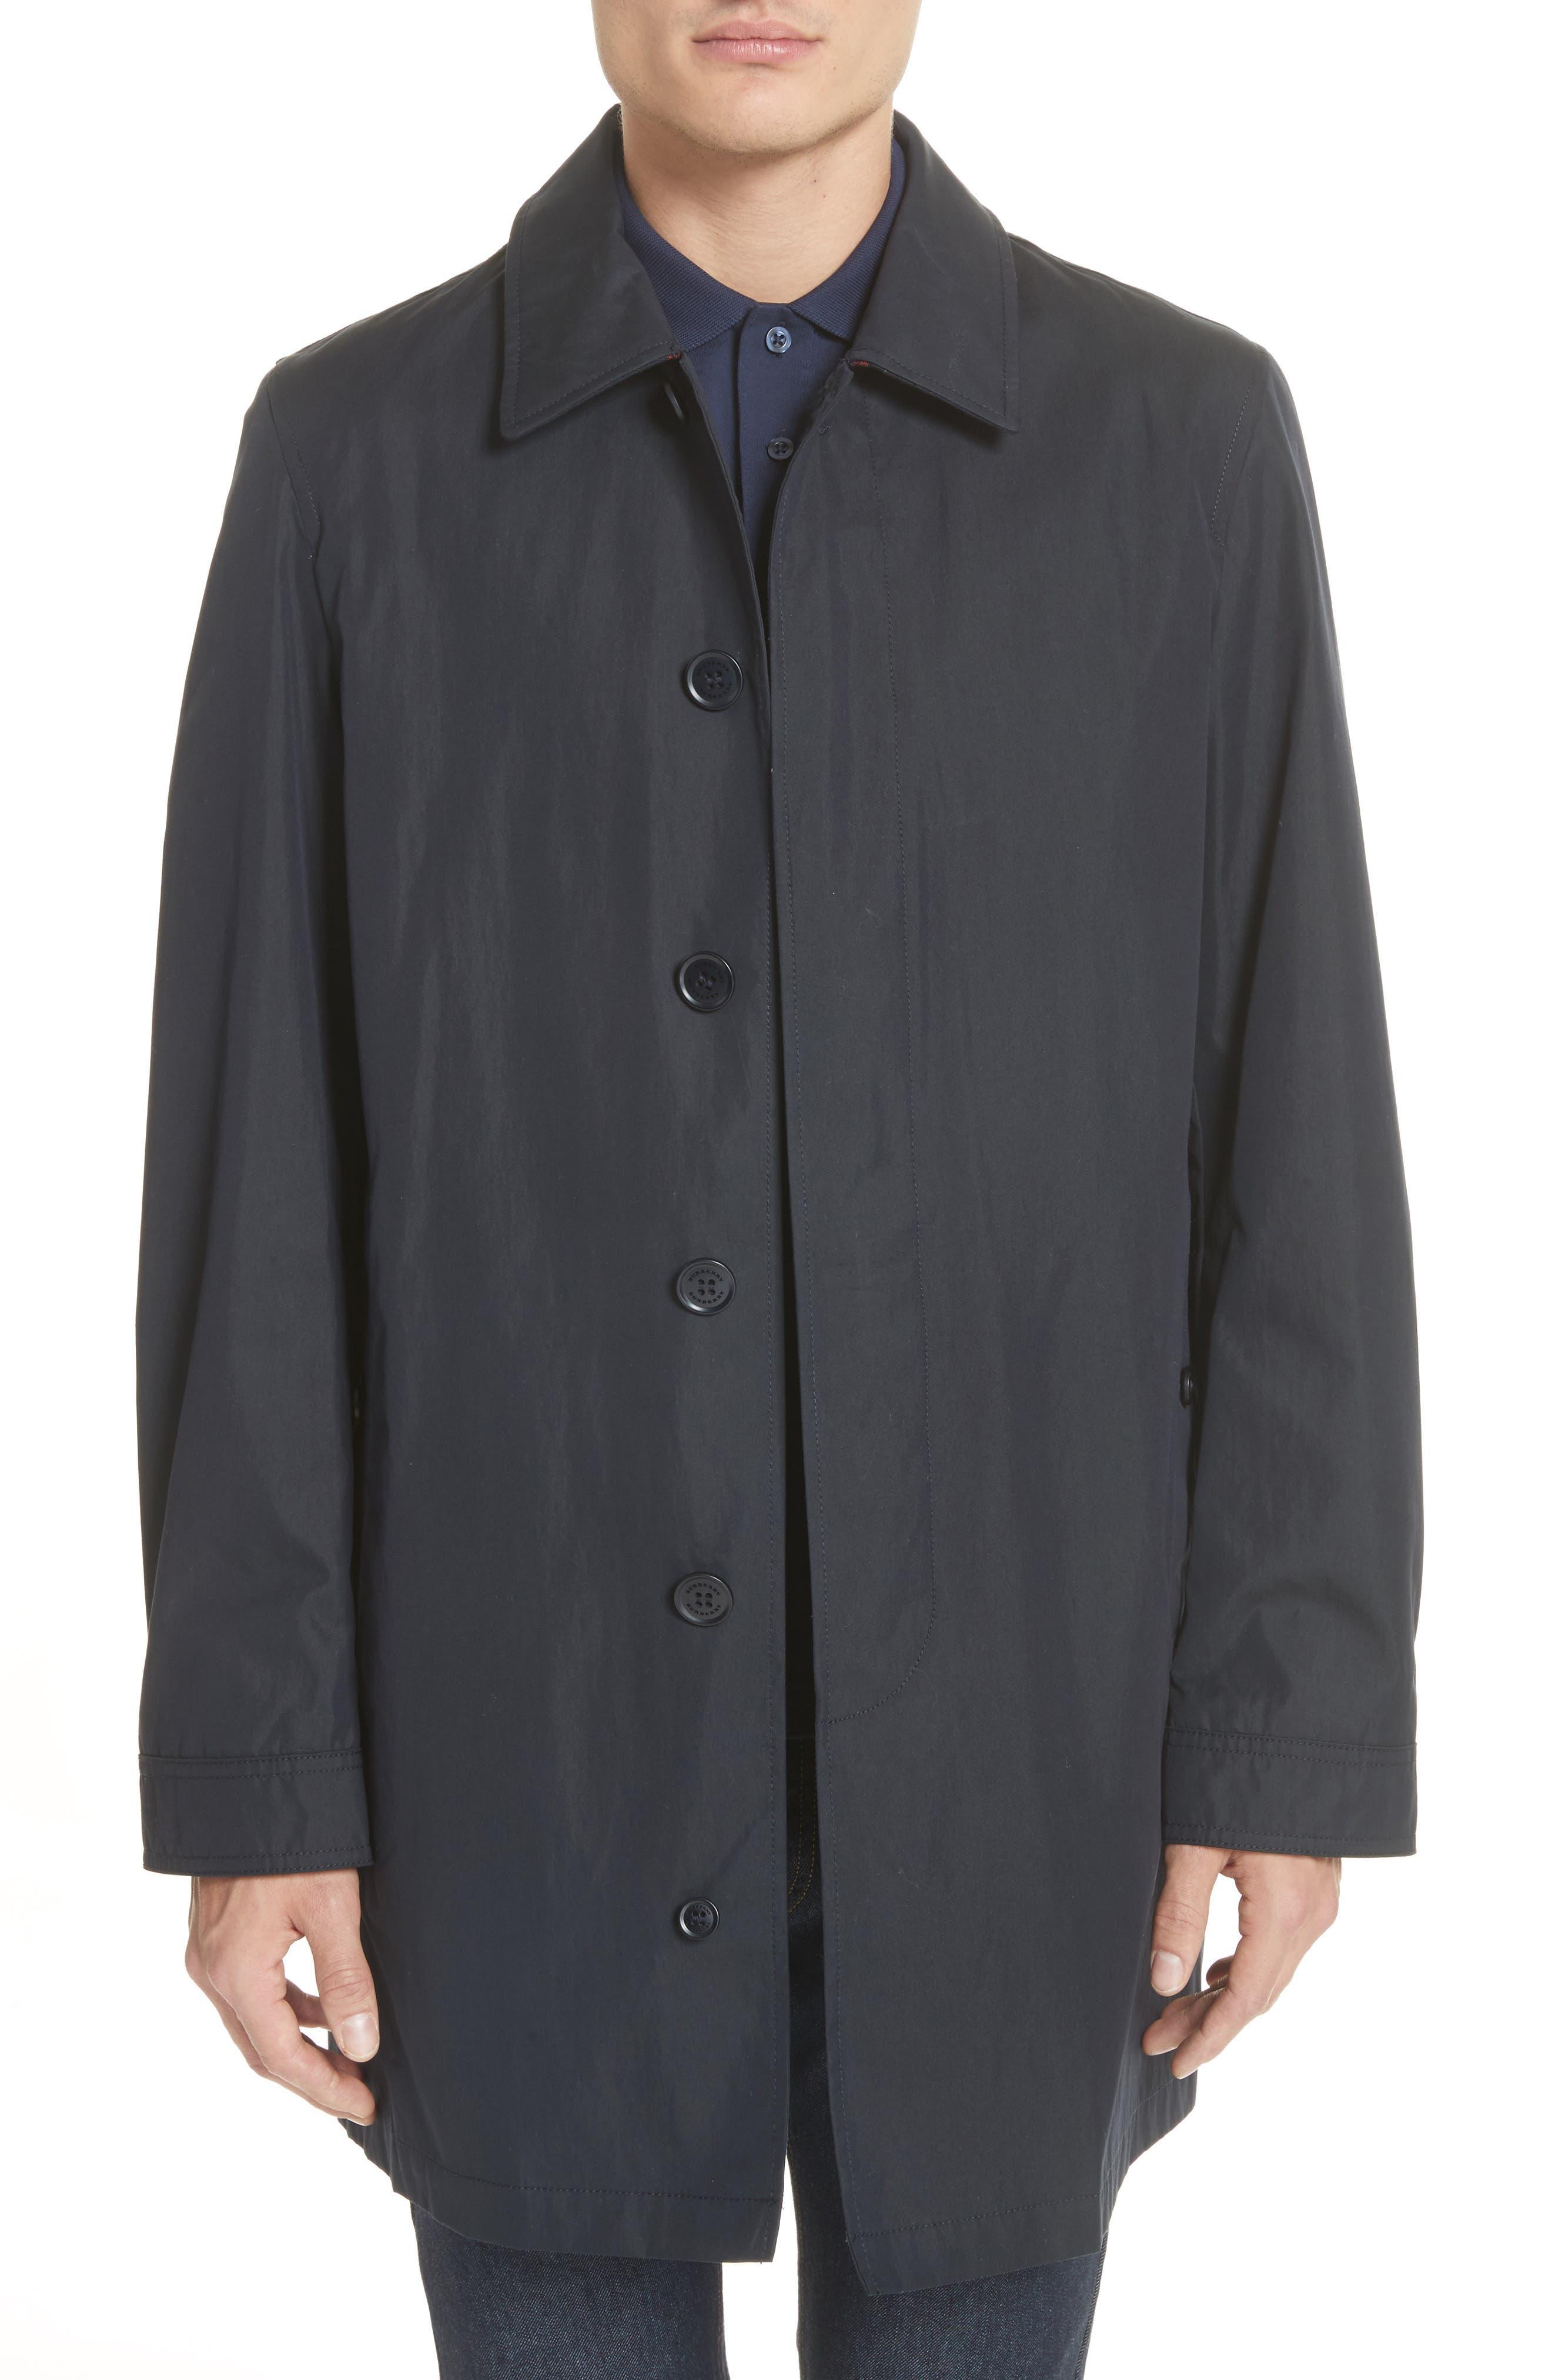 Main Image - Burberry Hardwick Regular Fit Technical Jacket